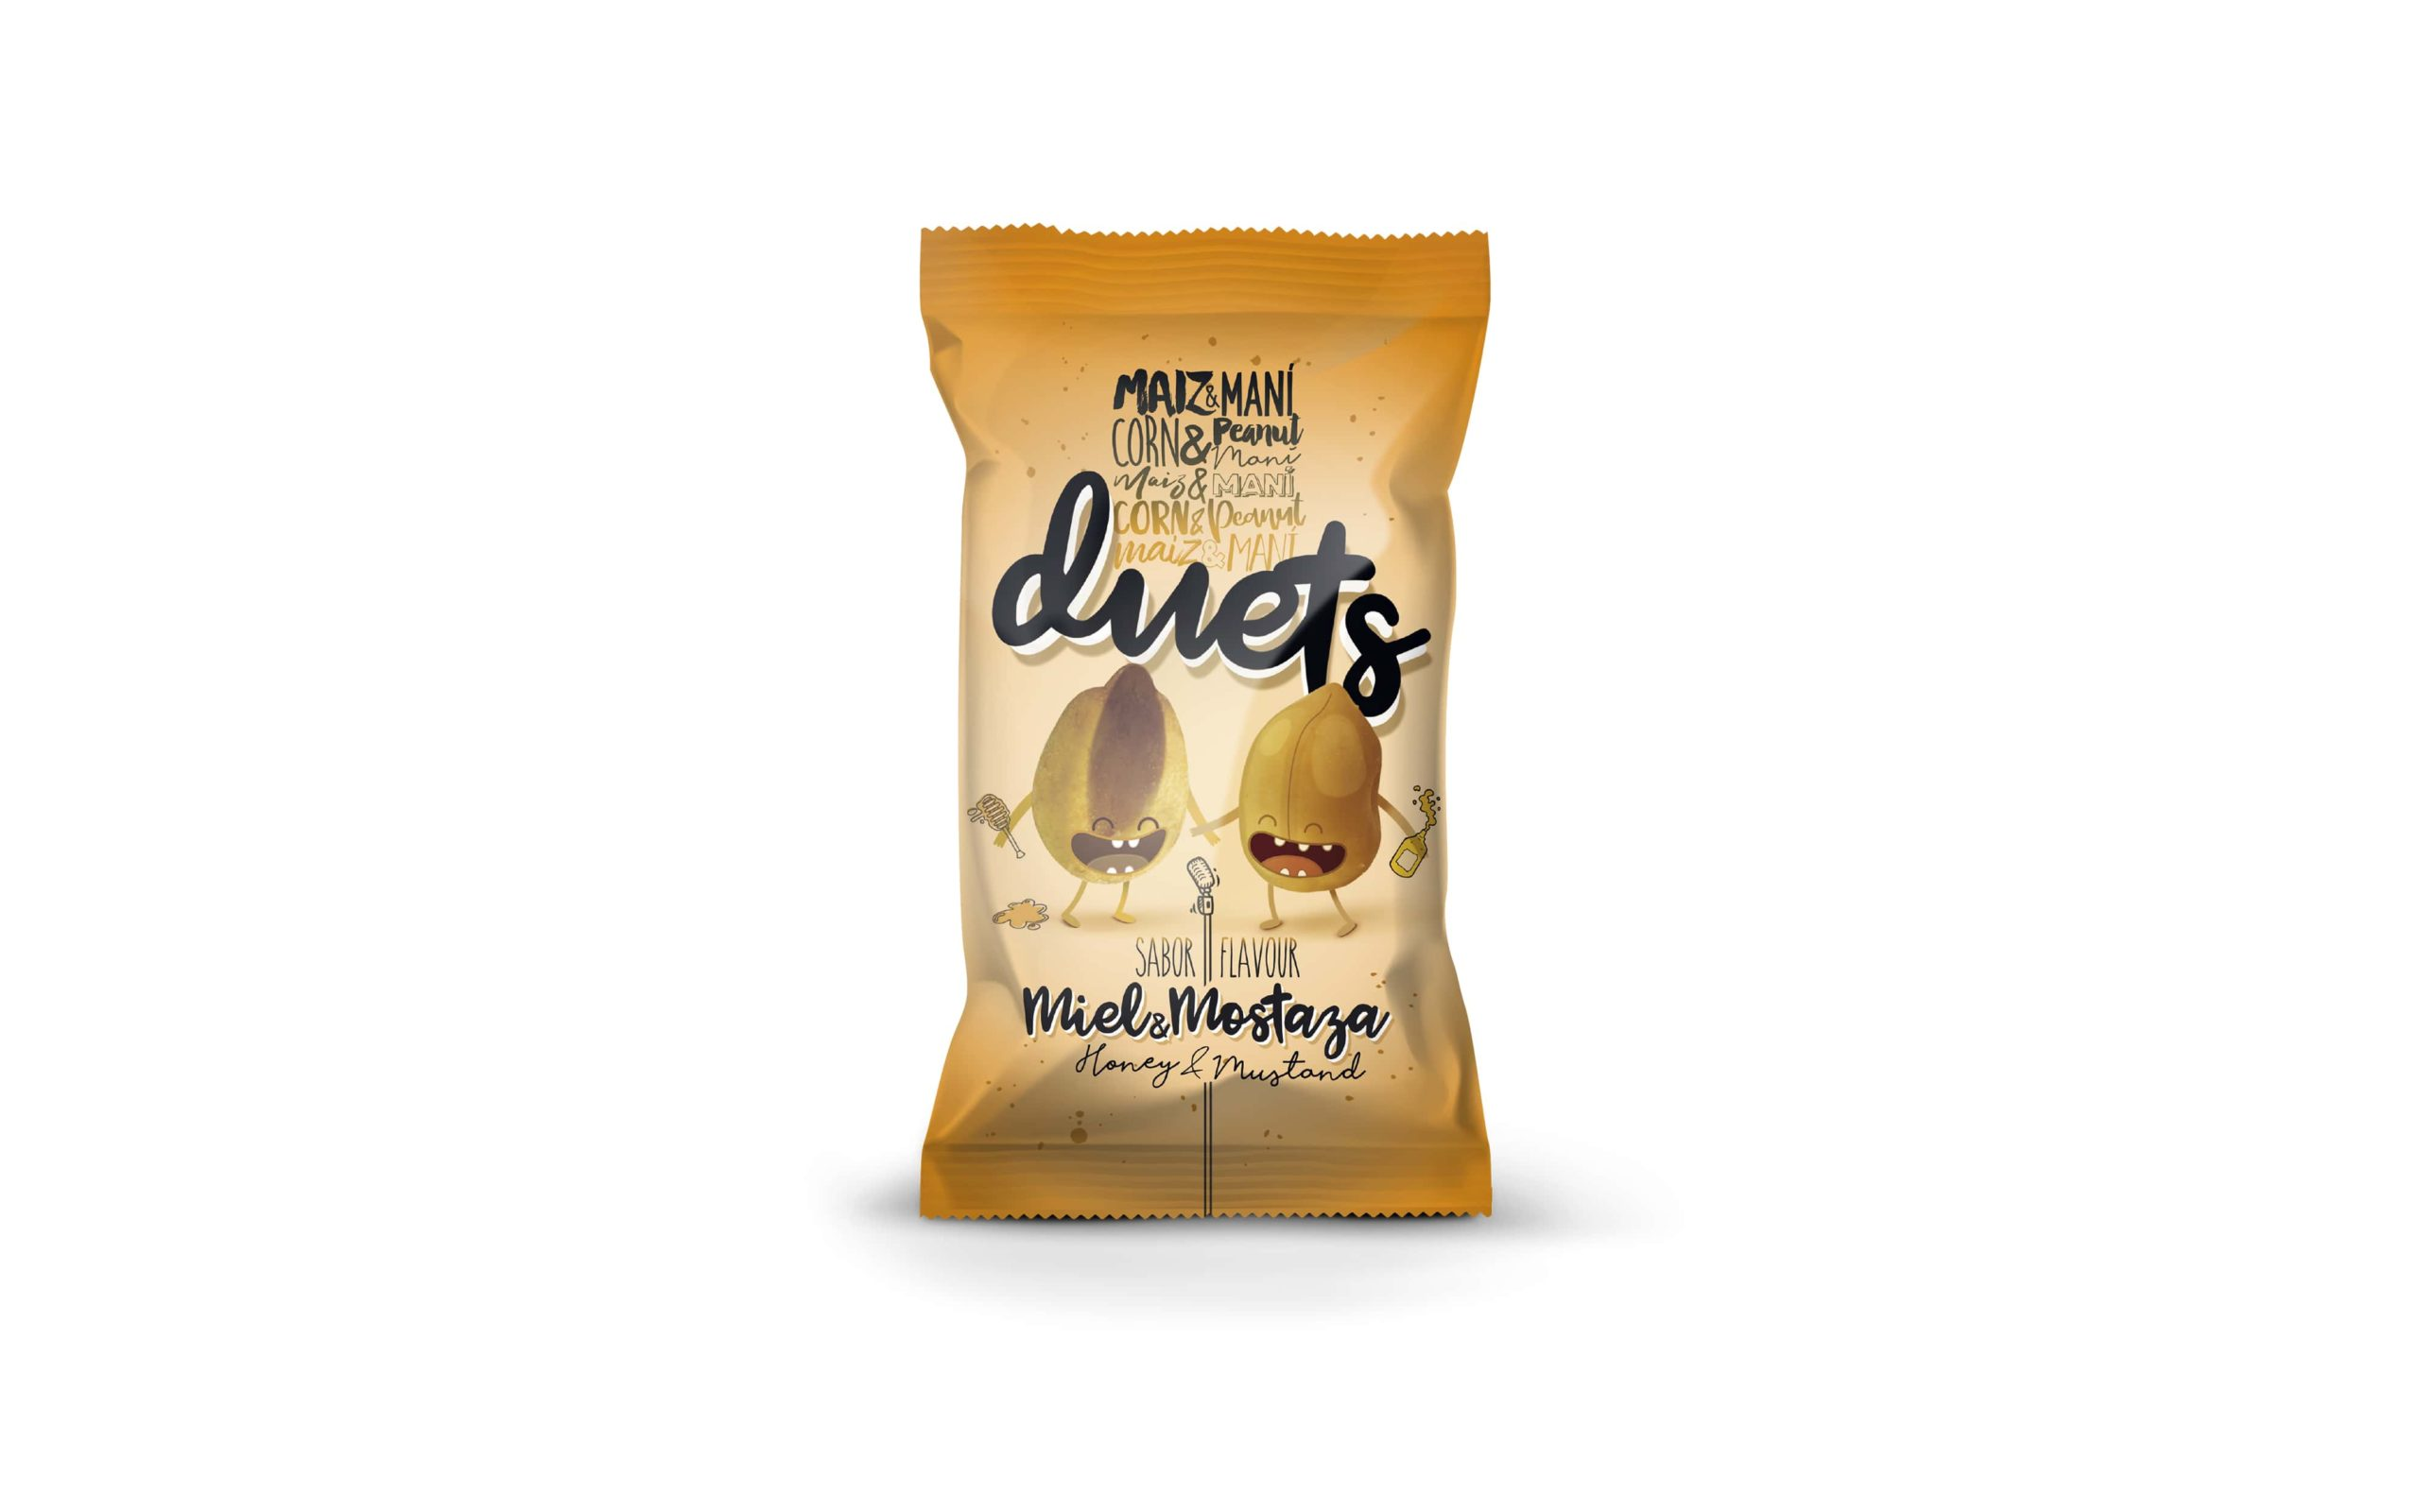 diseno-packaging-duets-miel-min